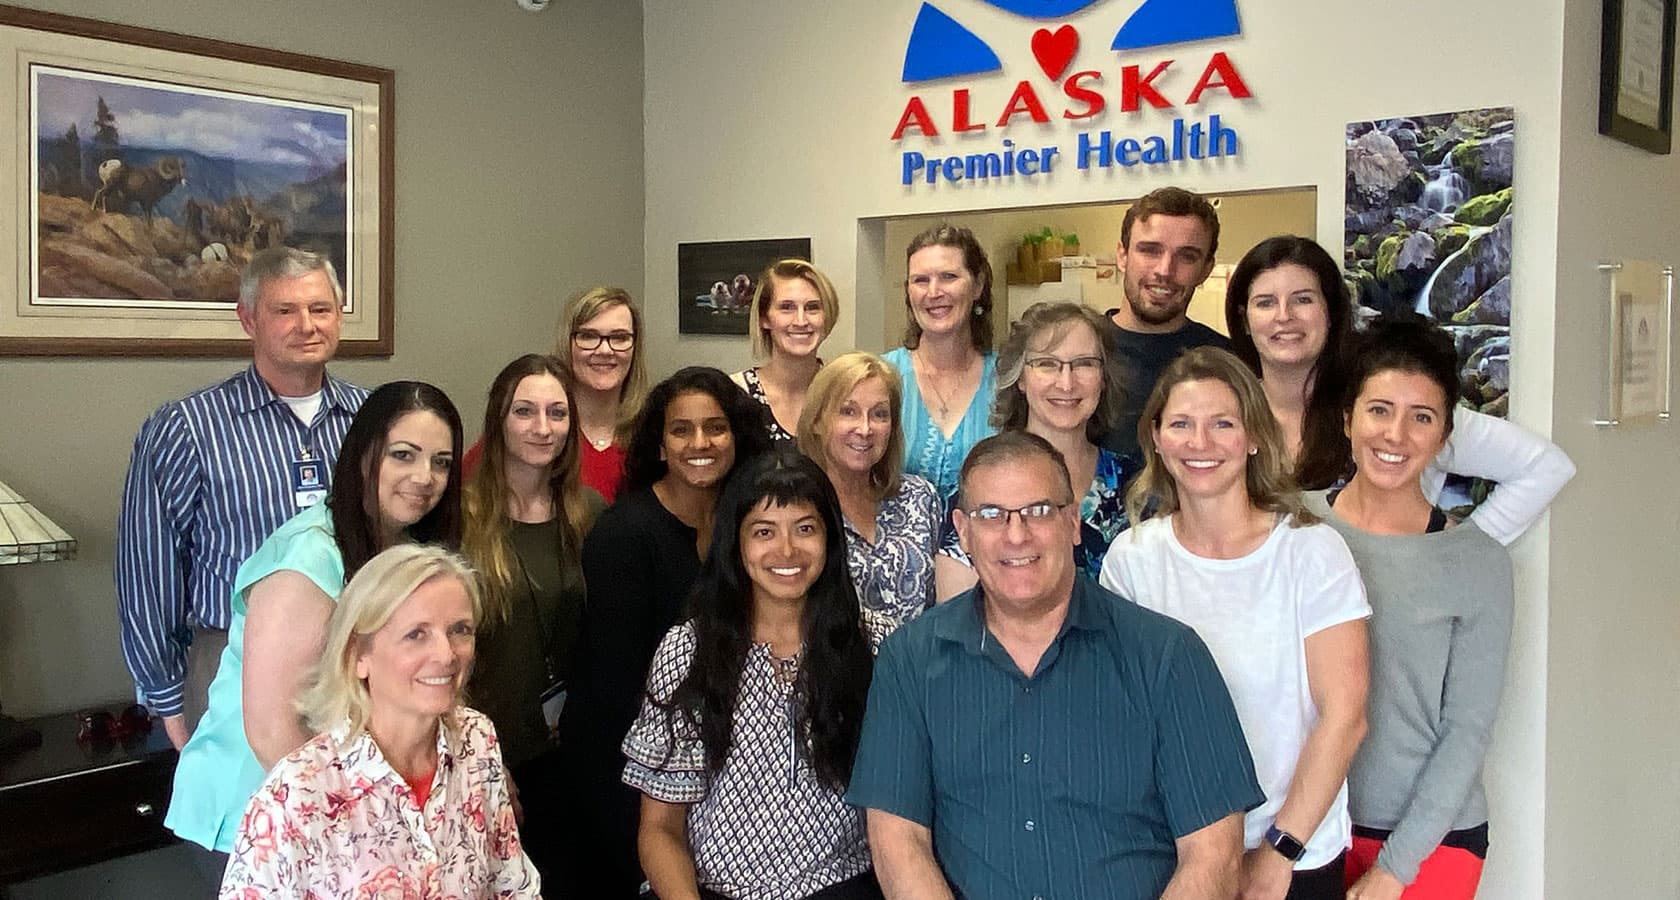 alaska premier health staff photo